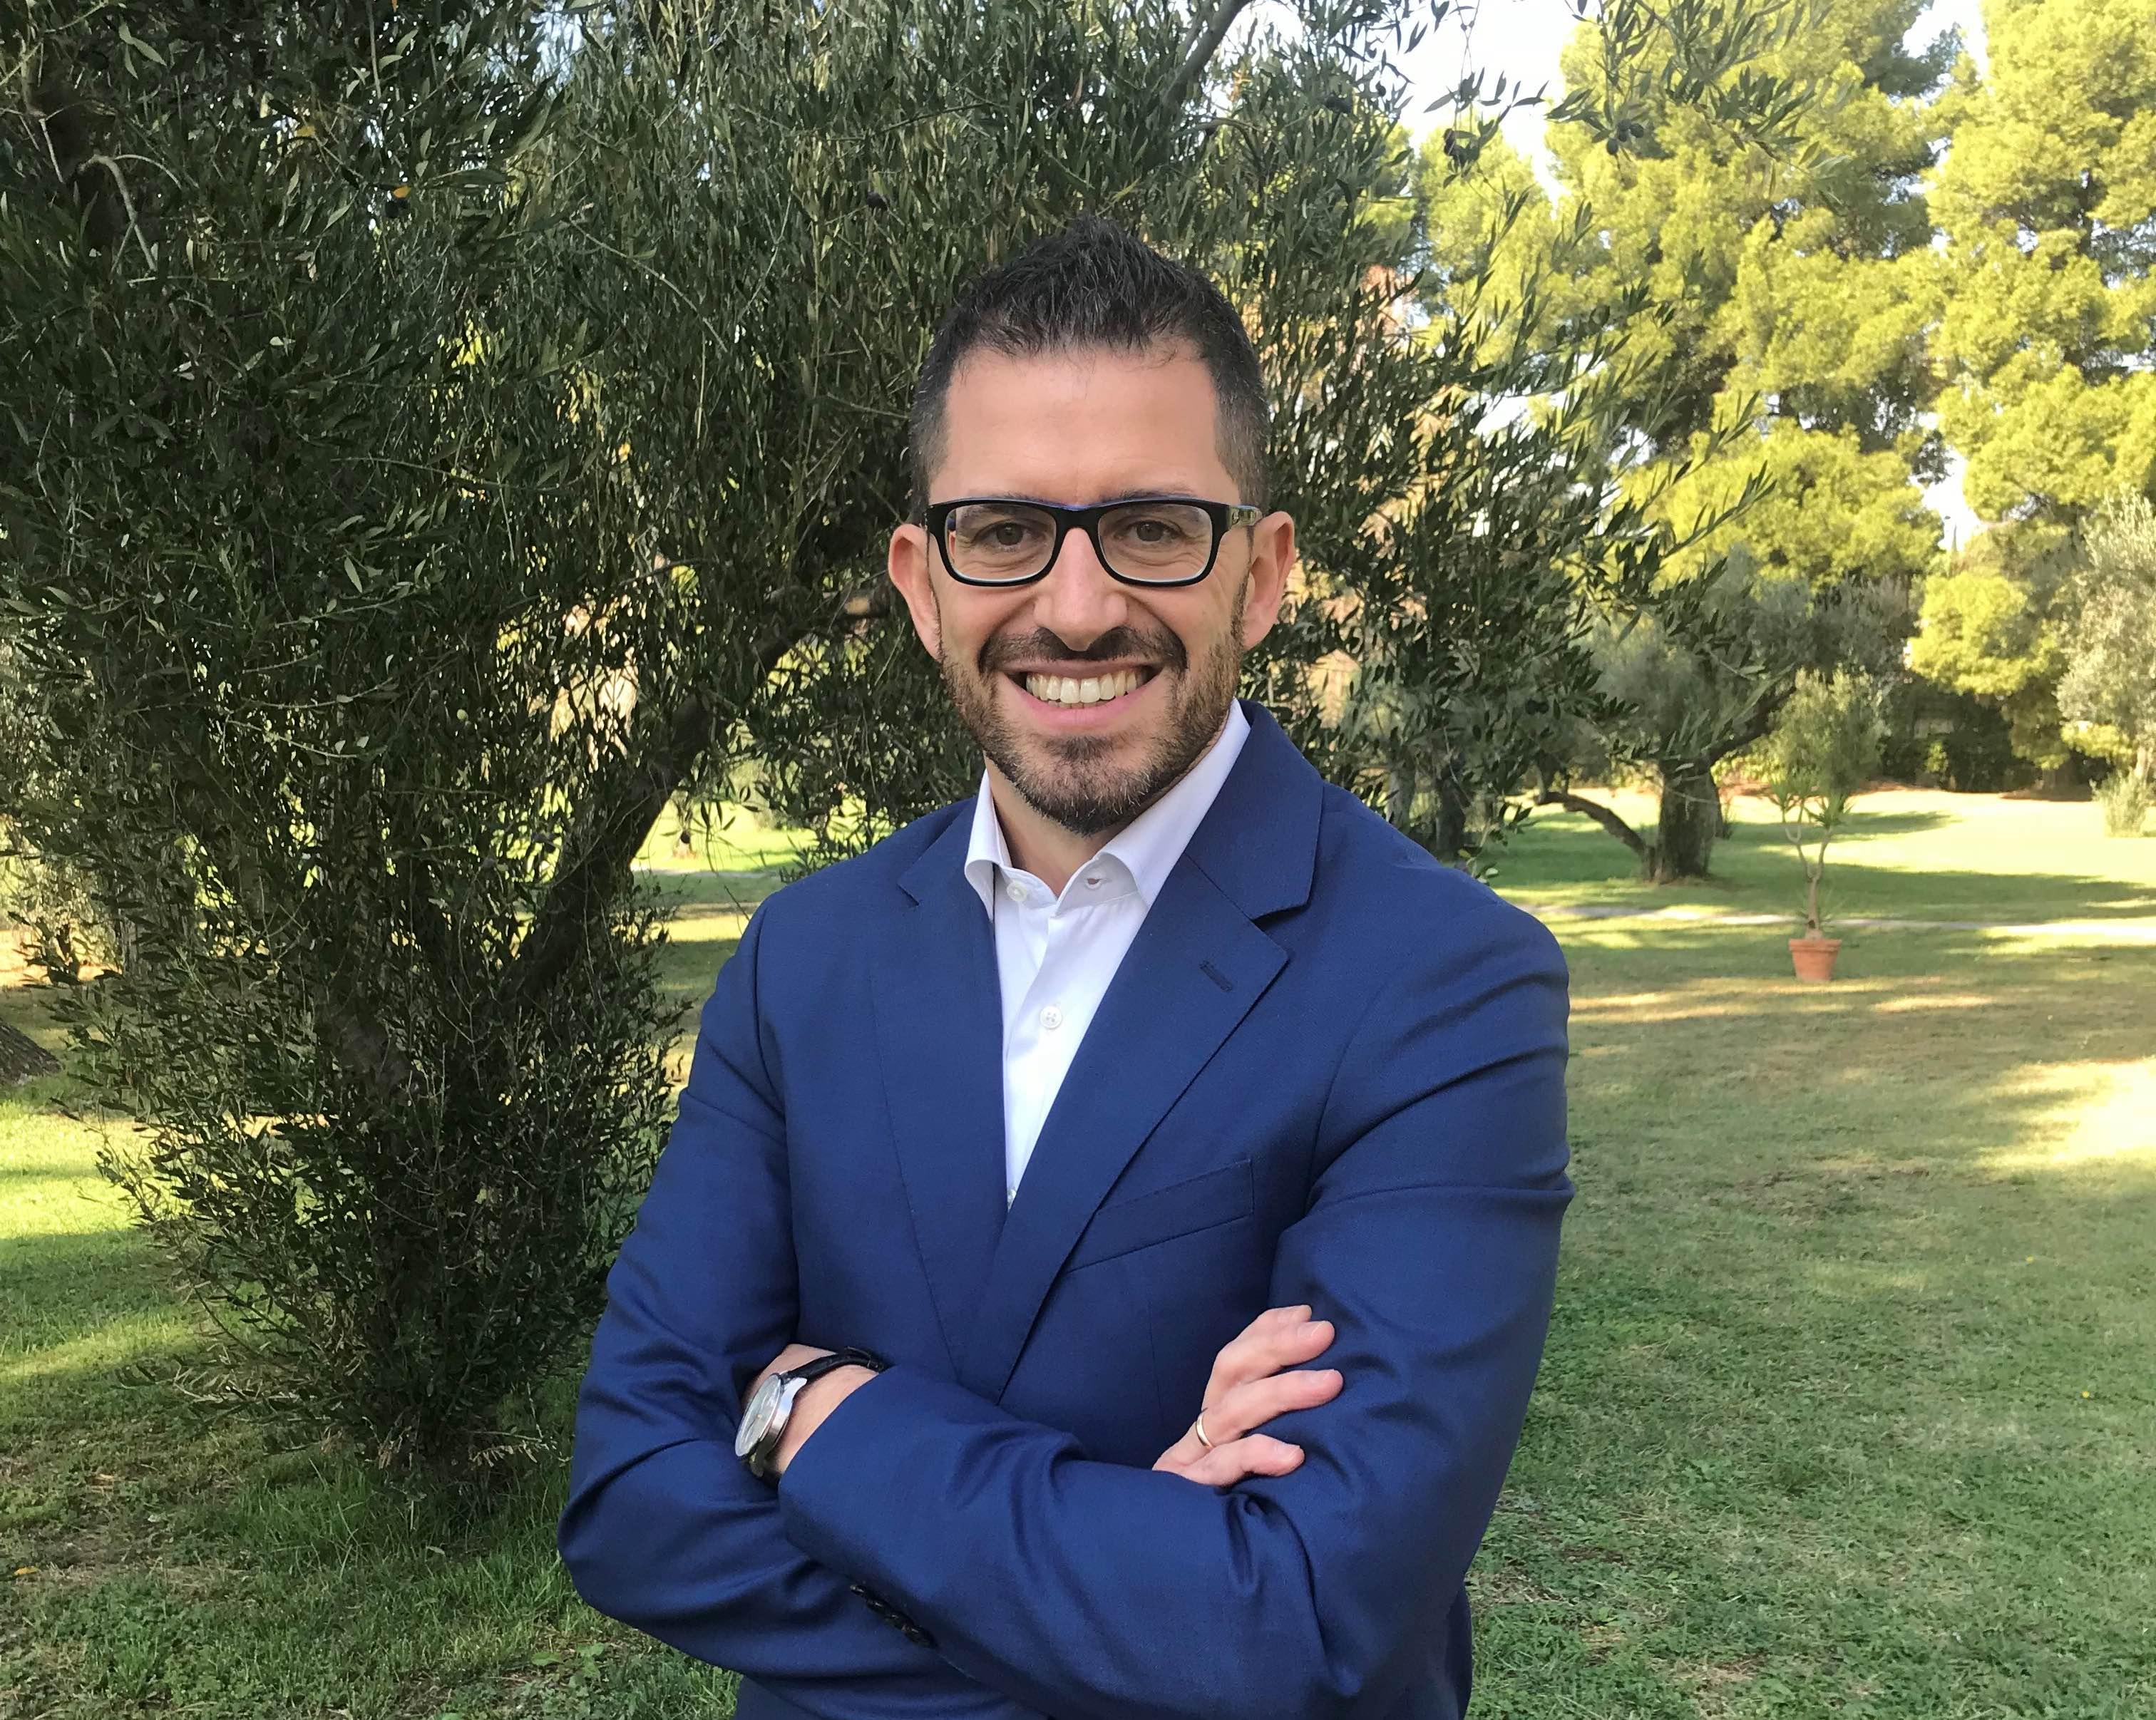 Elio Bartoli, President EMEA & Global OEM Trelleborg Wheel Systems